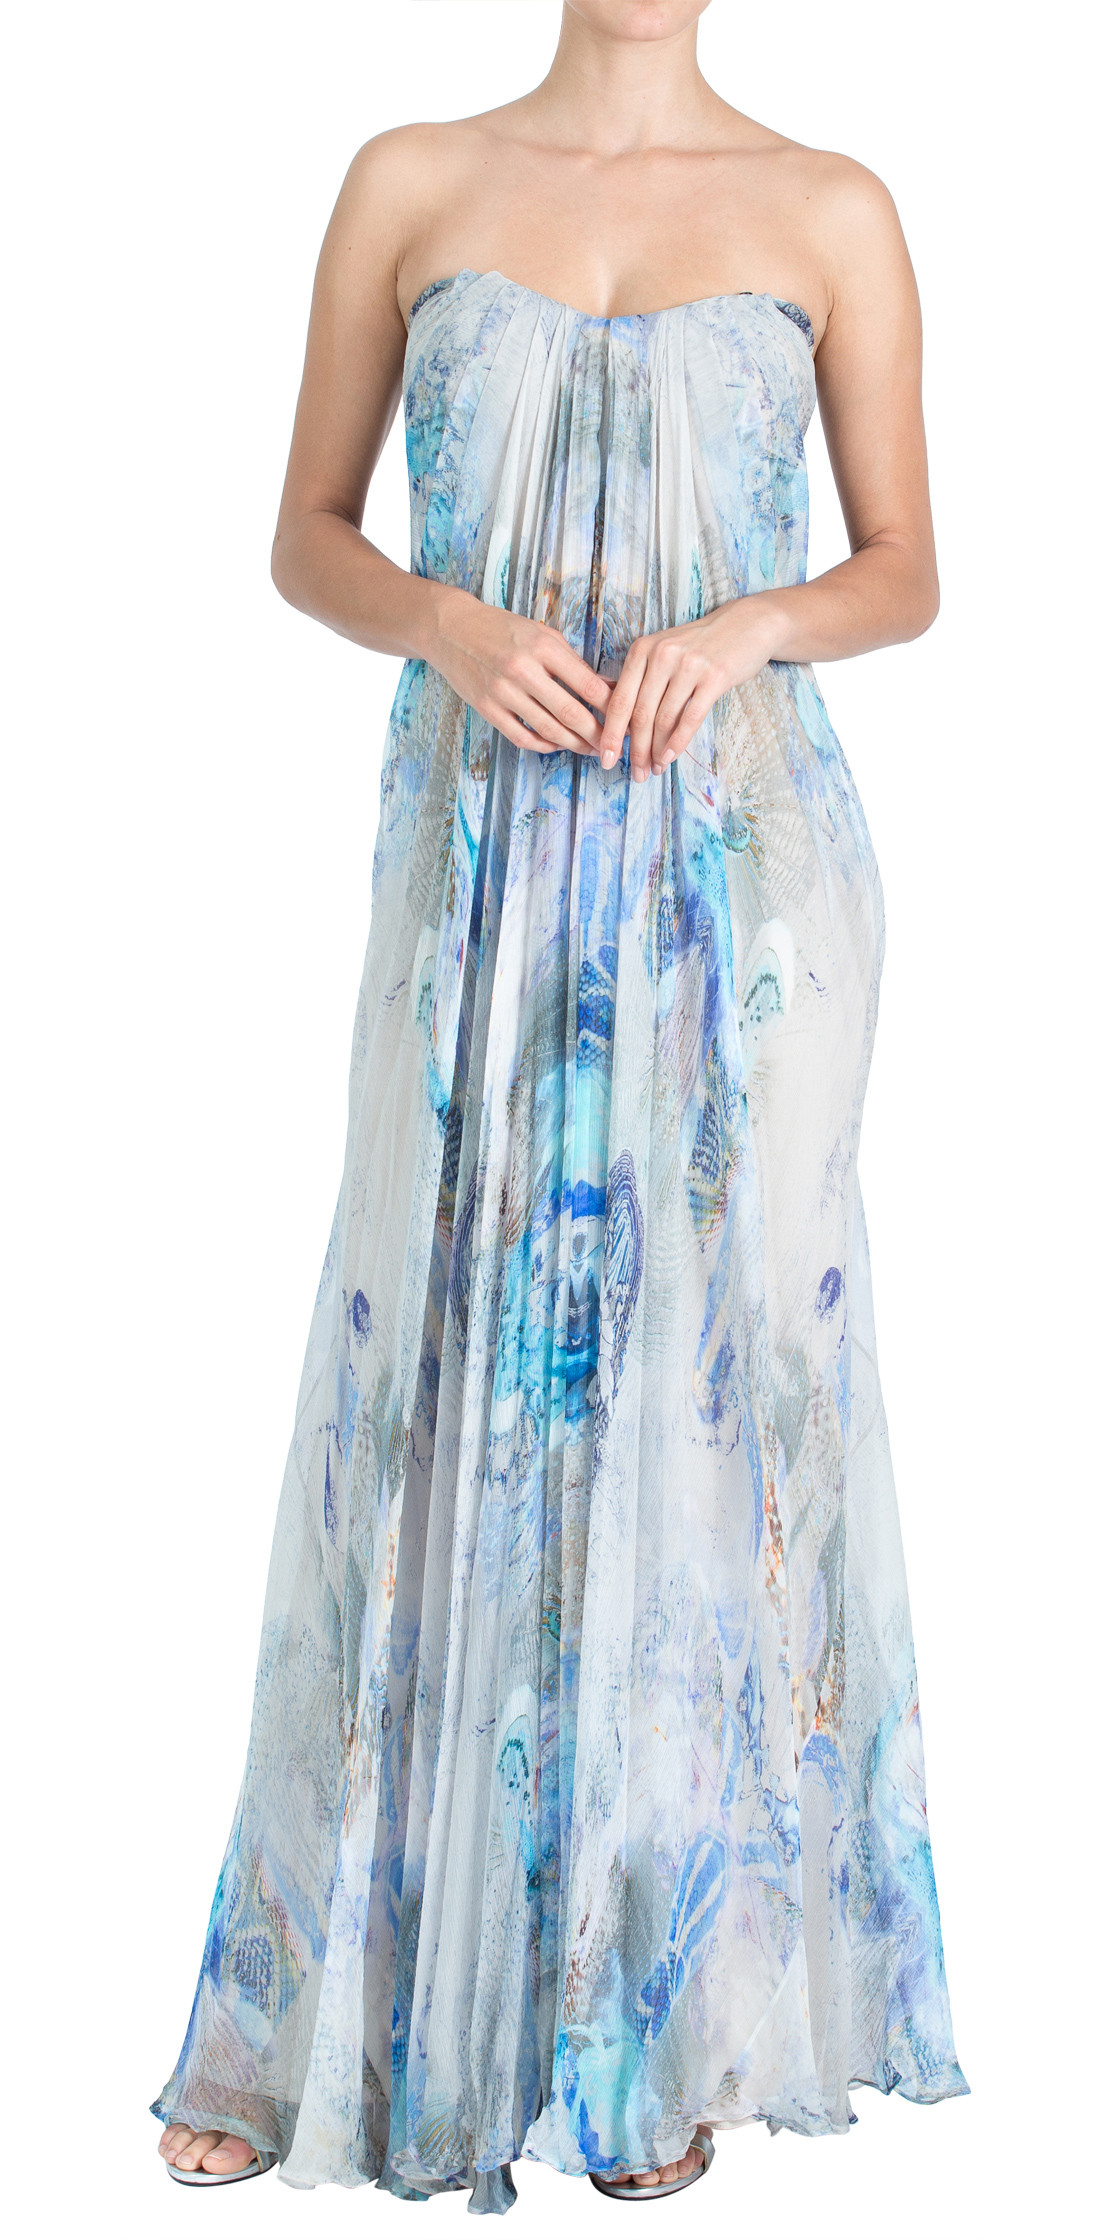 Alexander McQueen Strapless Chiffon Gown